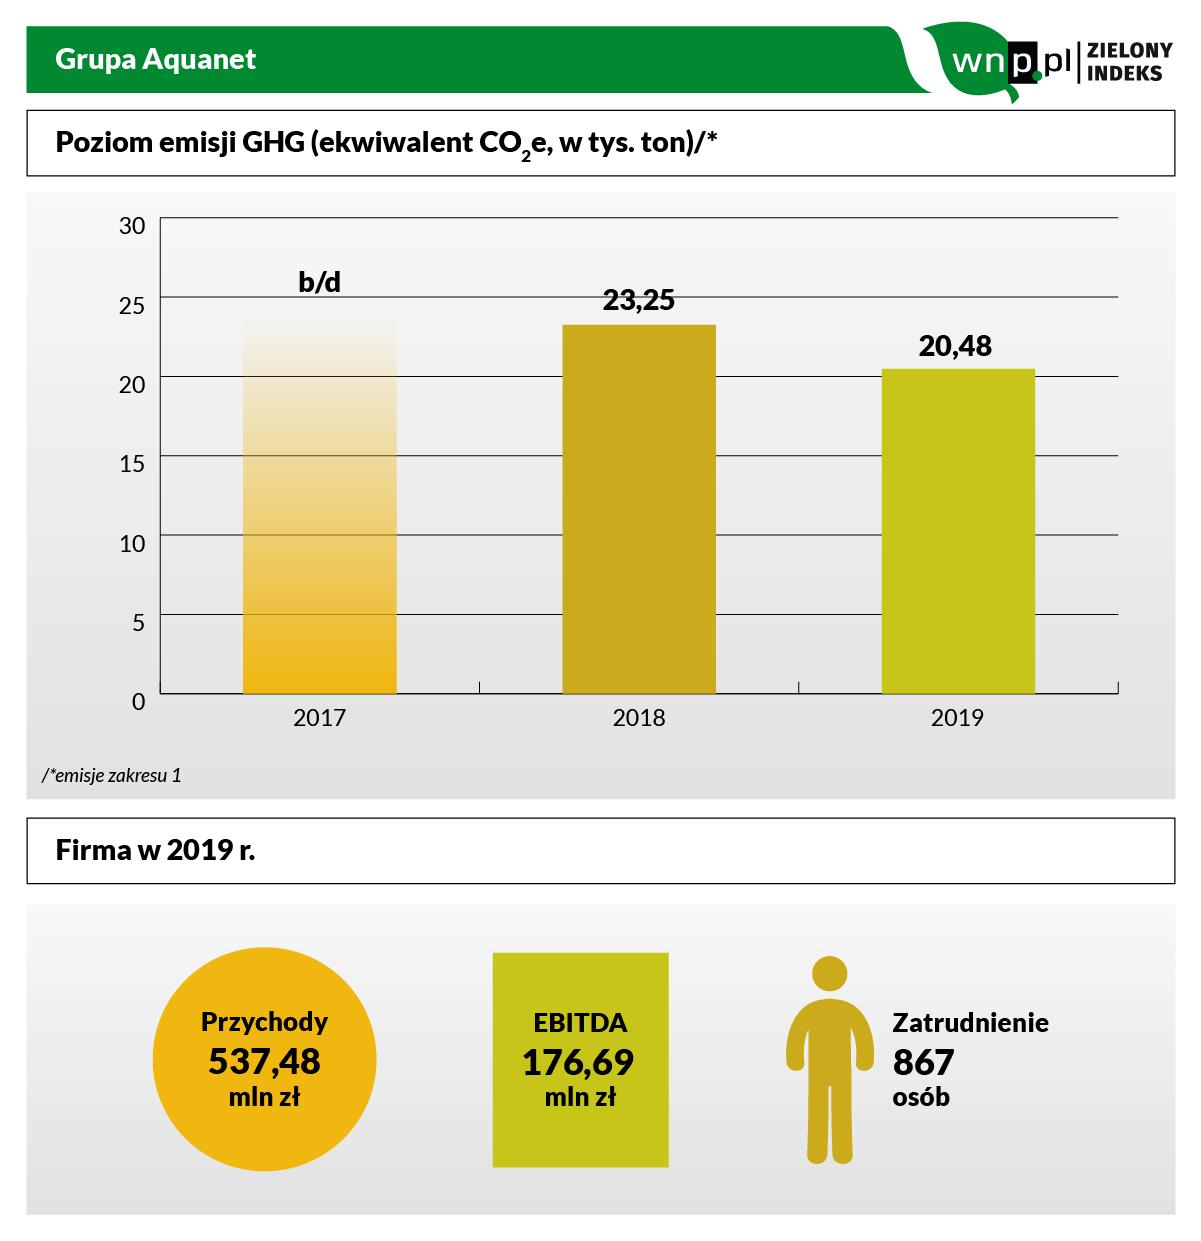 Grupa Aquanet do Zielonego Indeksu.png (infografika: PTWP)